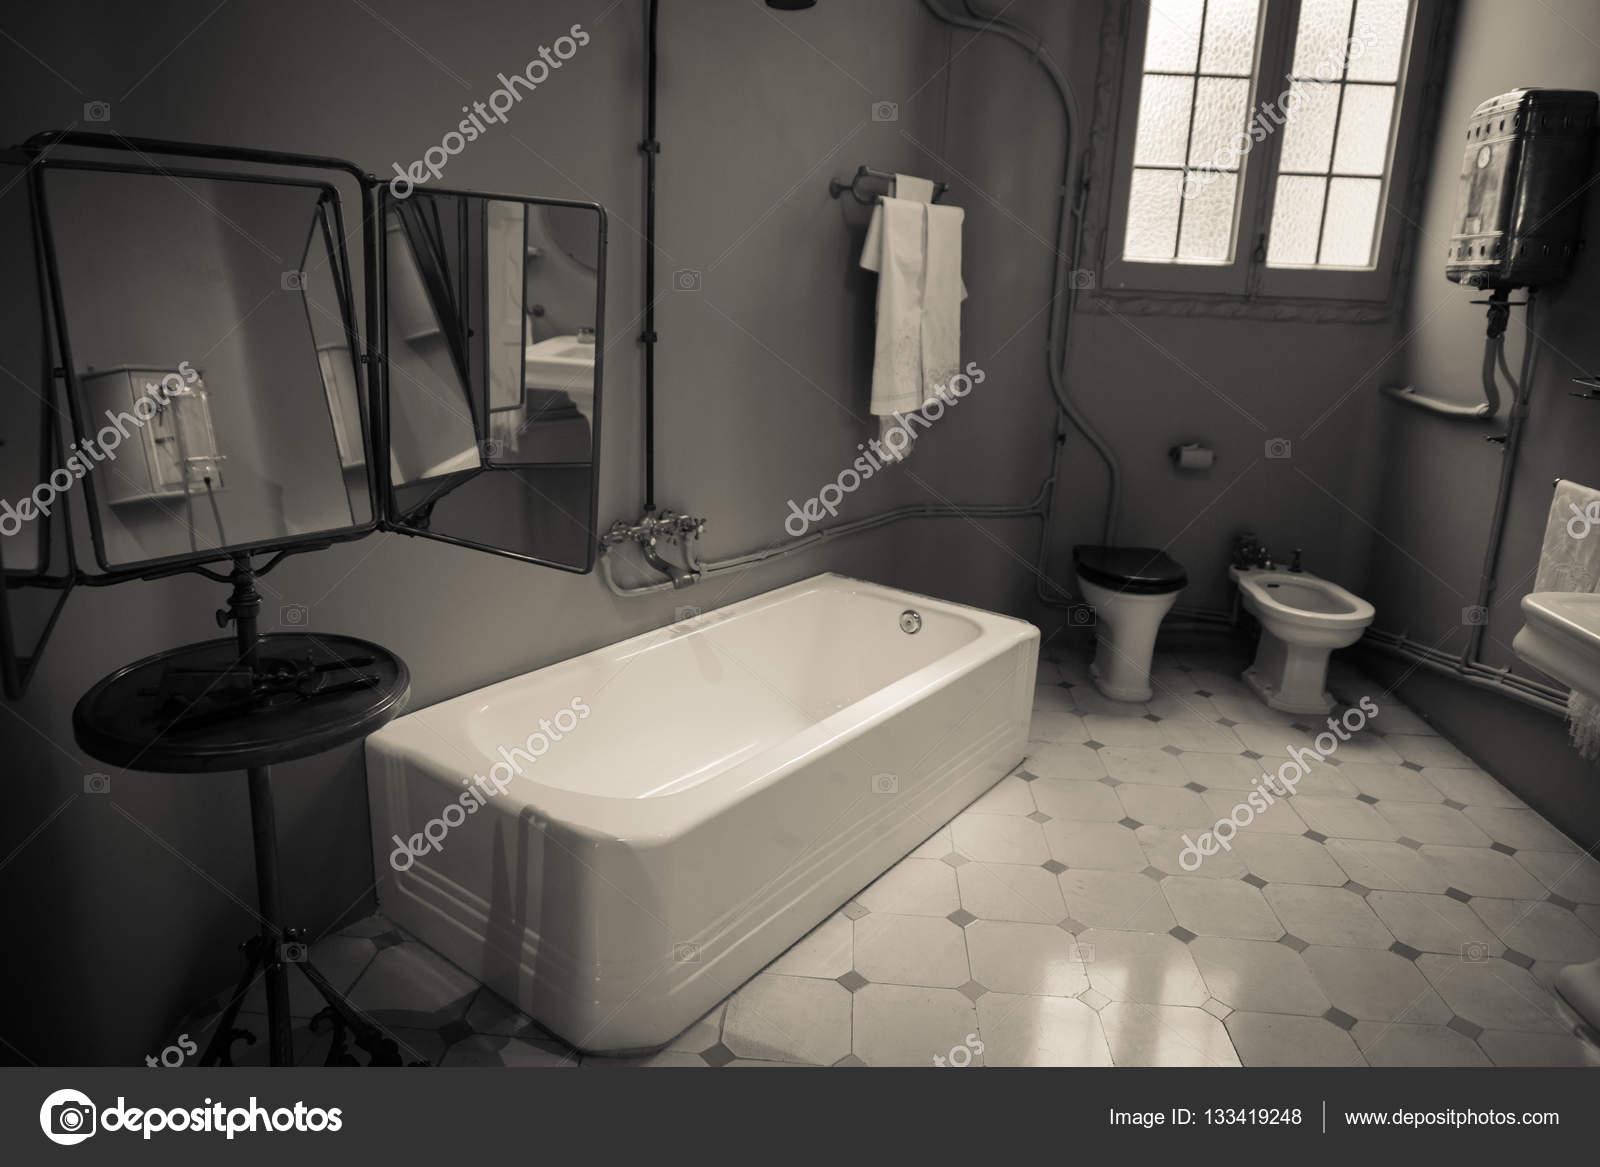 https://st3.depositphotos.com/4889221/13341/i/1600/depositphotos_133419248-stockafbeelding-oude-ouderwetse-badkamer.jpg